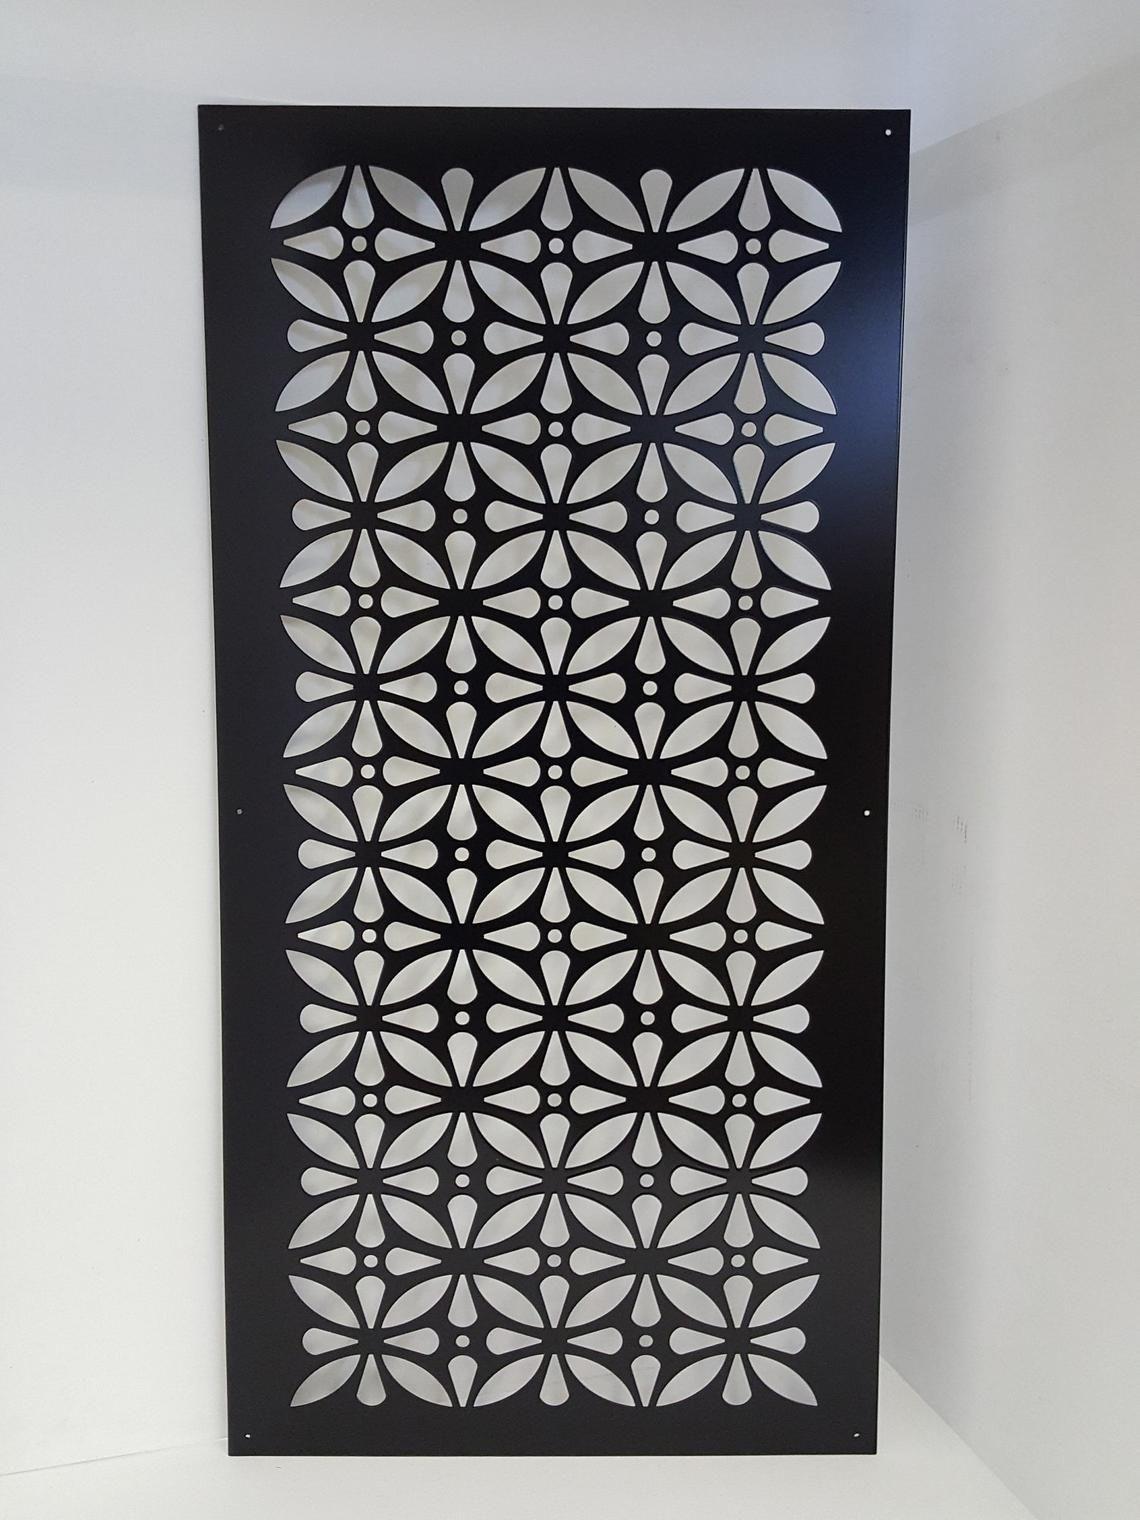 HIDDENFLOWER9 - Metal Privacy Screen Decorative Panel Garden Decor